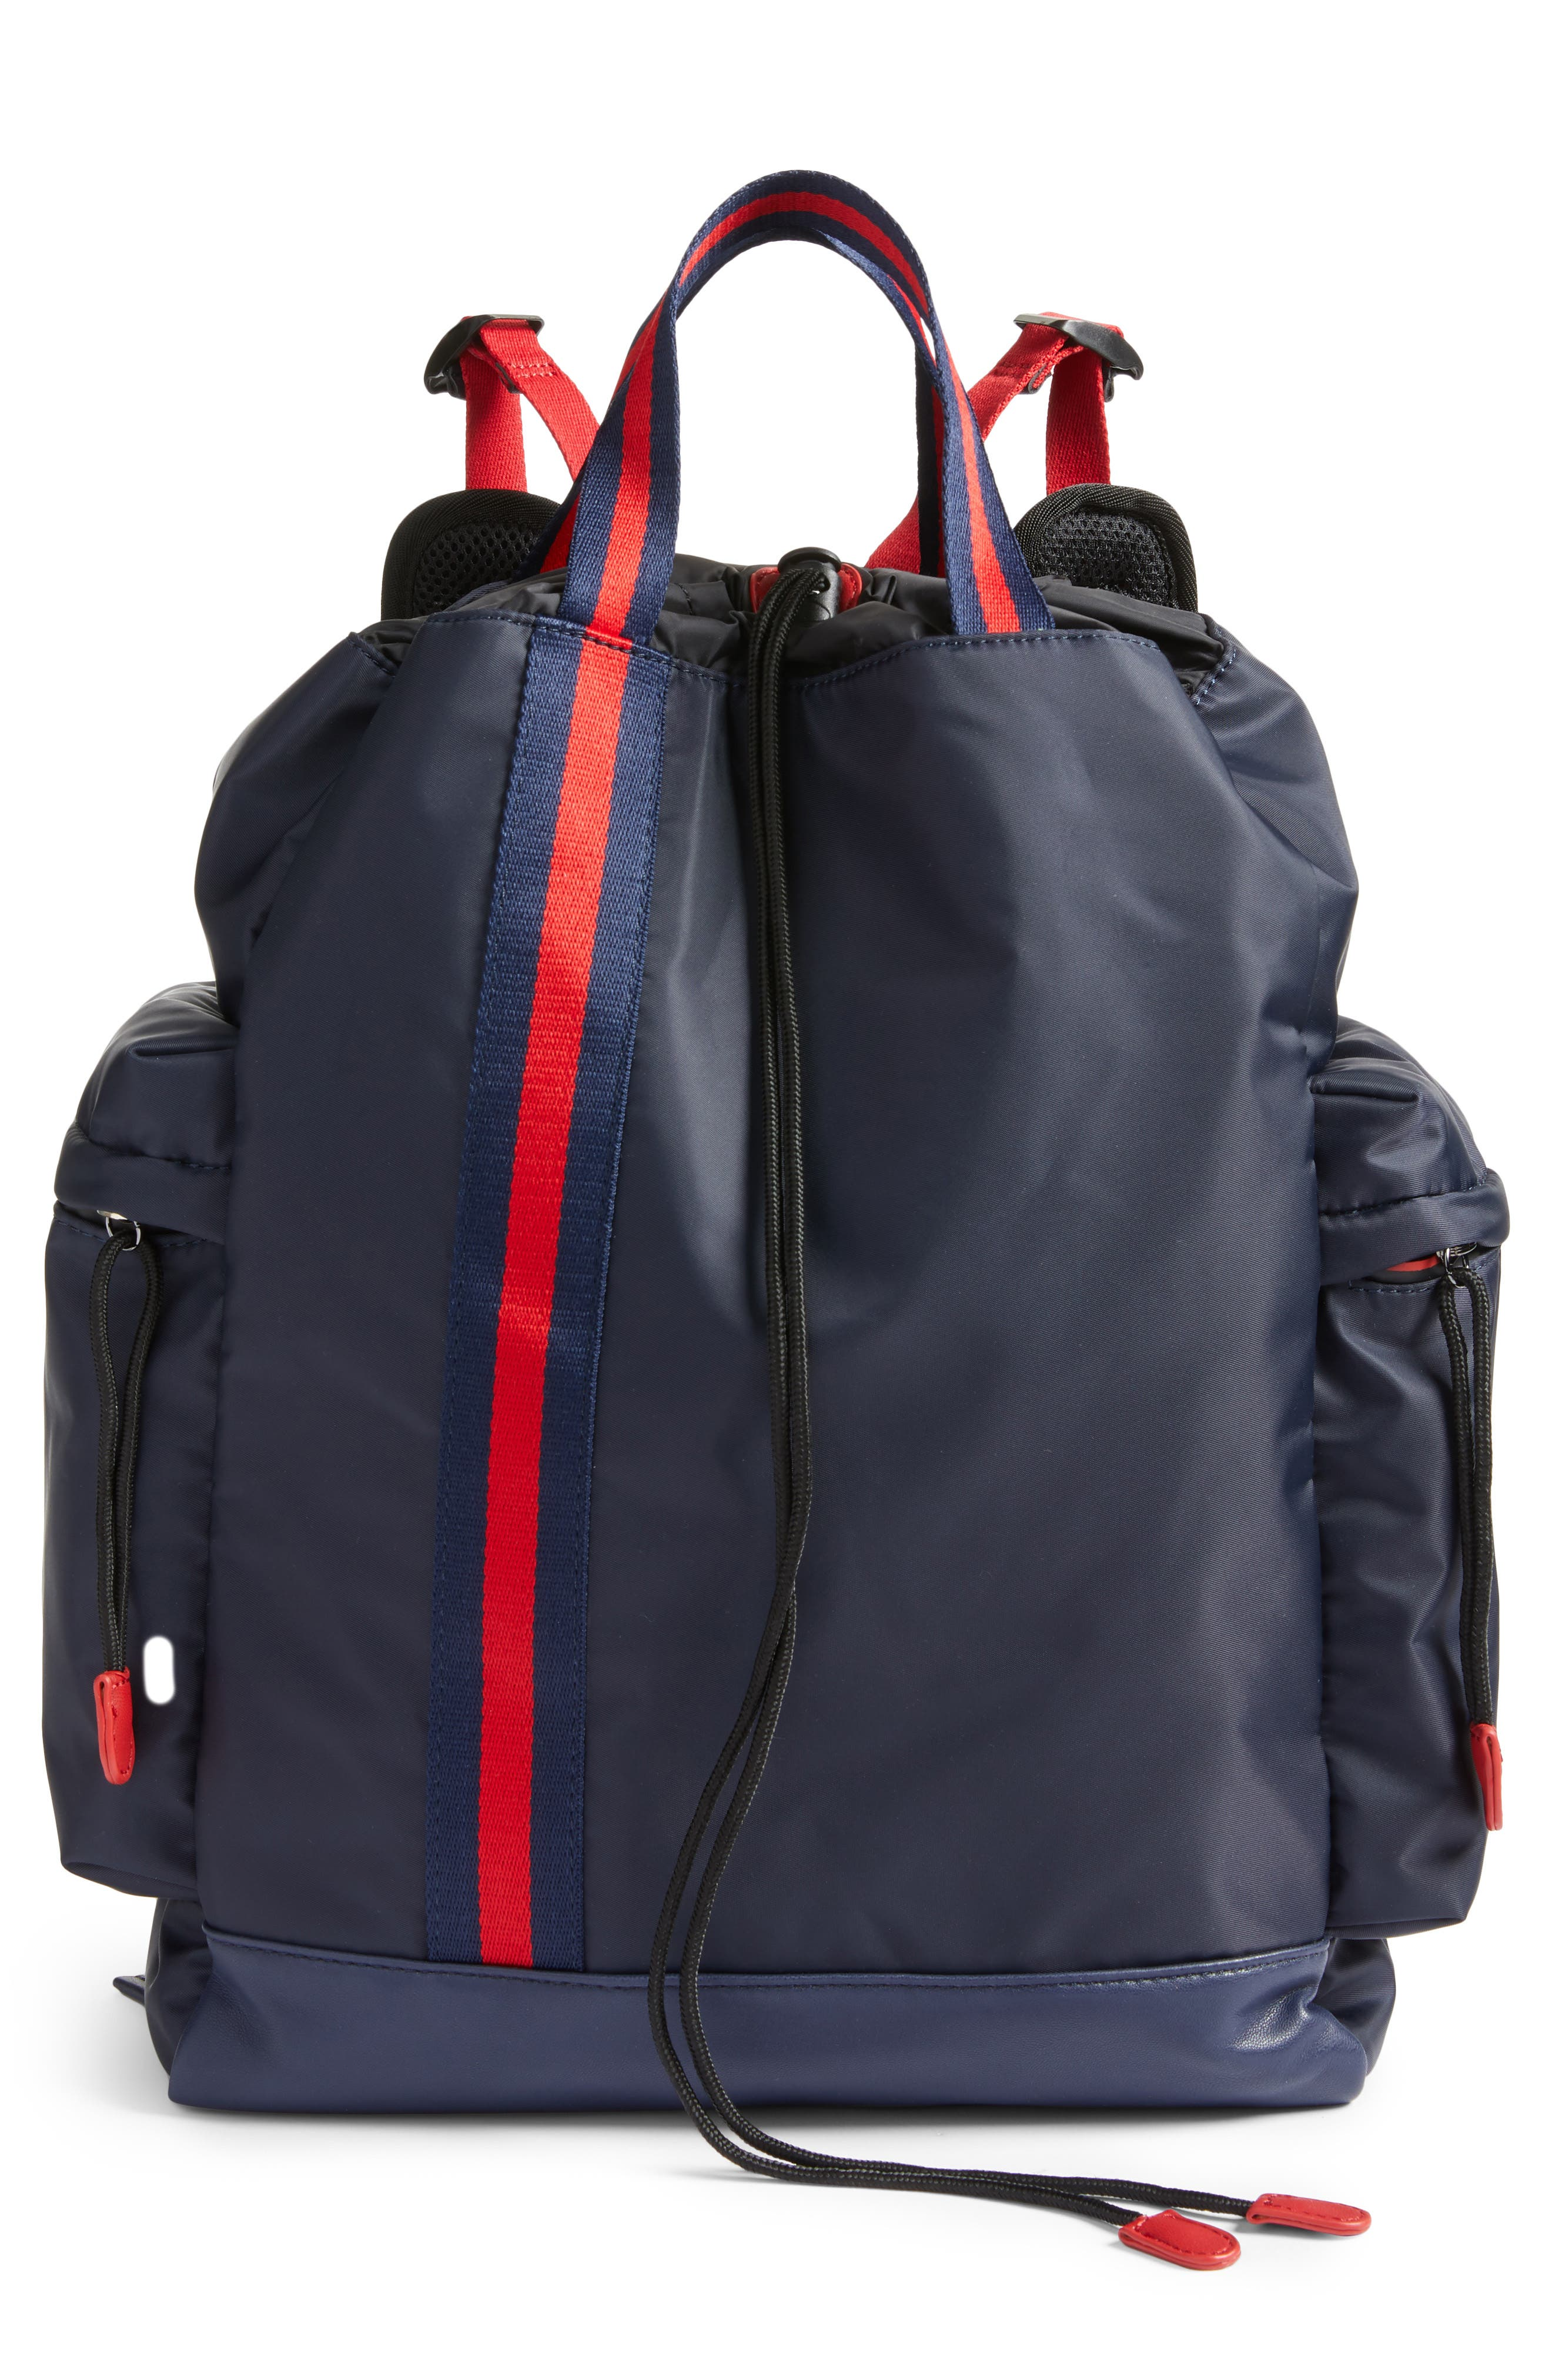 Yungg Stripe Strap Backpack,                             Main thumbnail 1, color,                             400